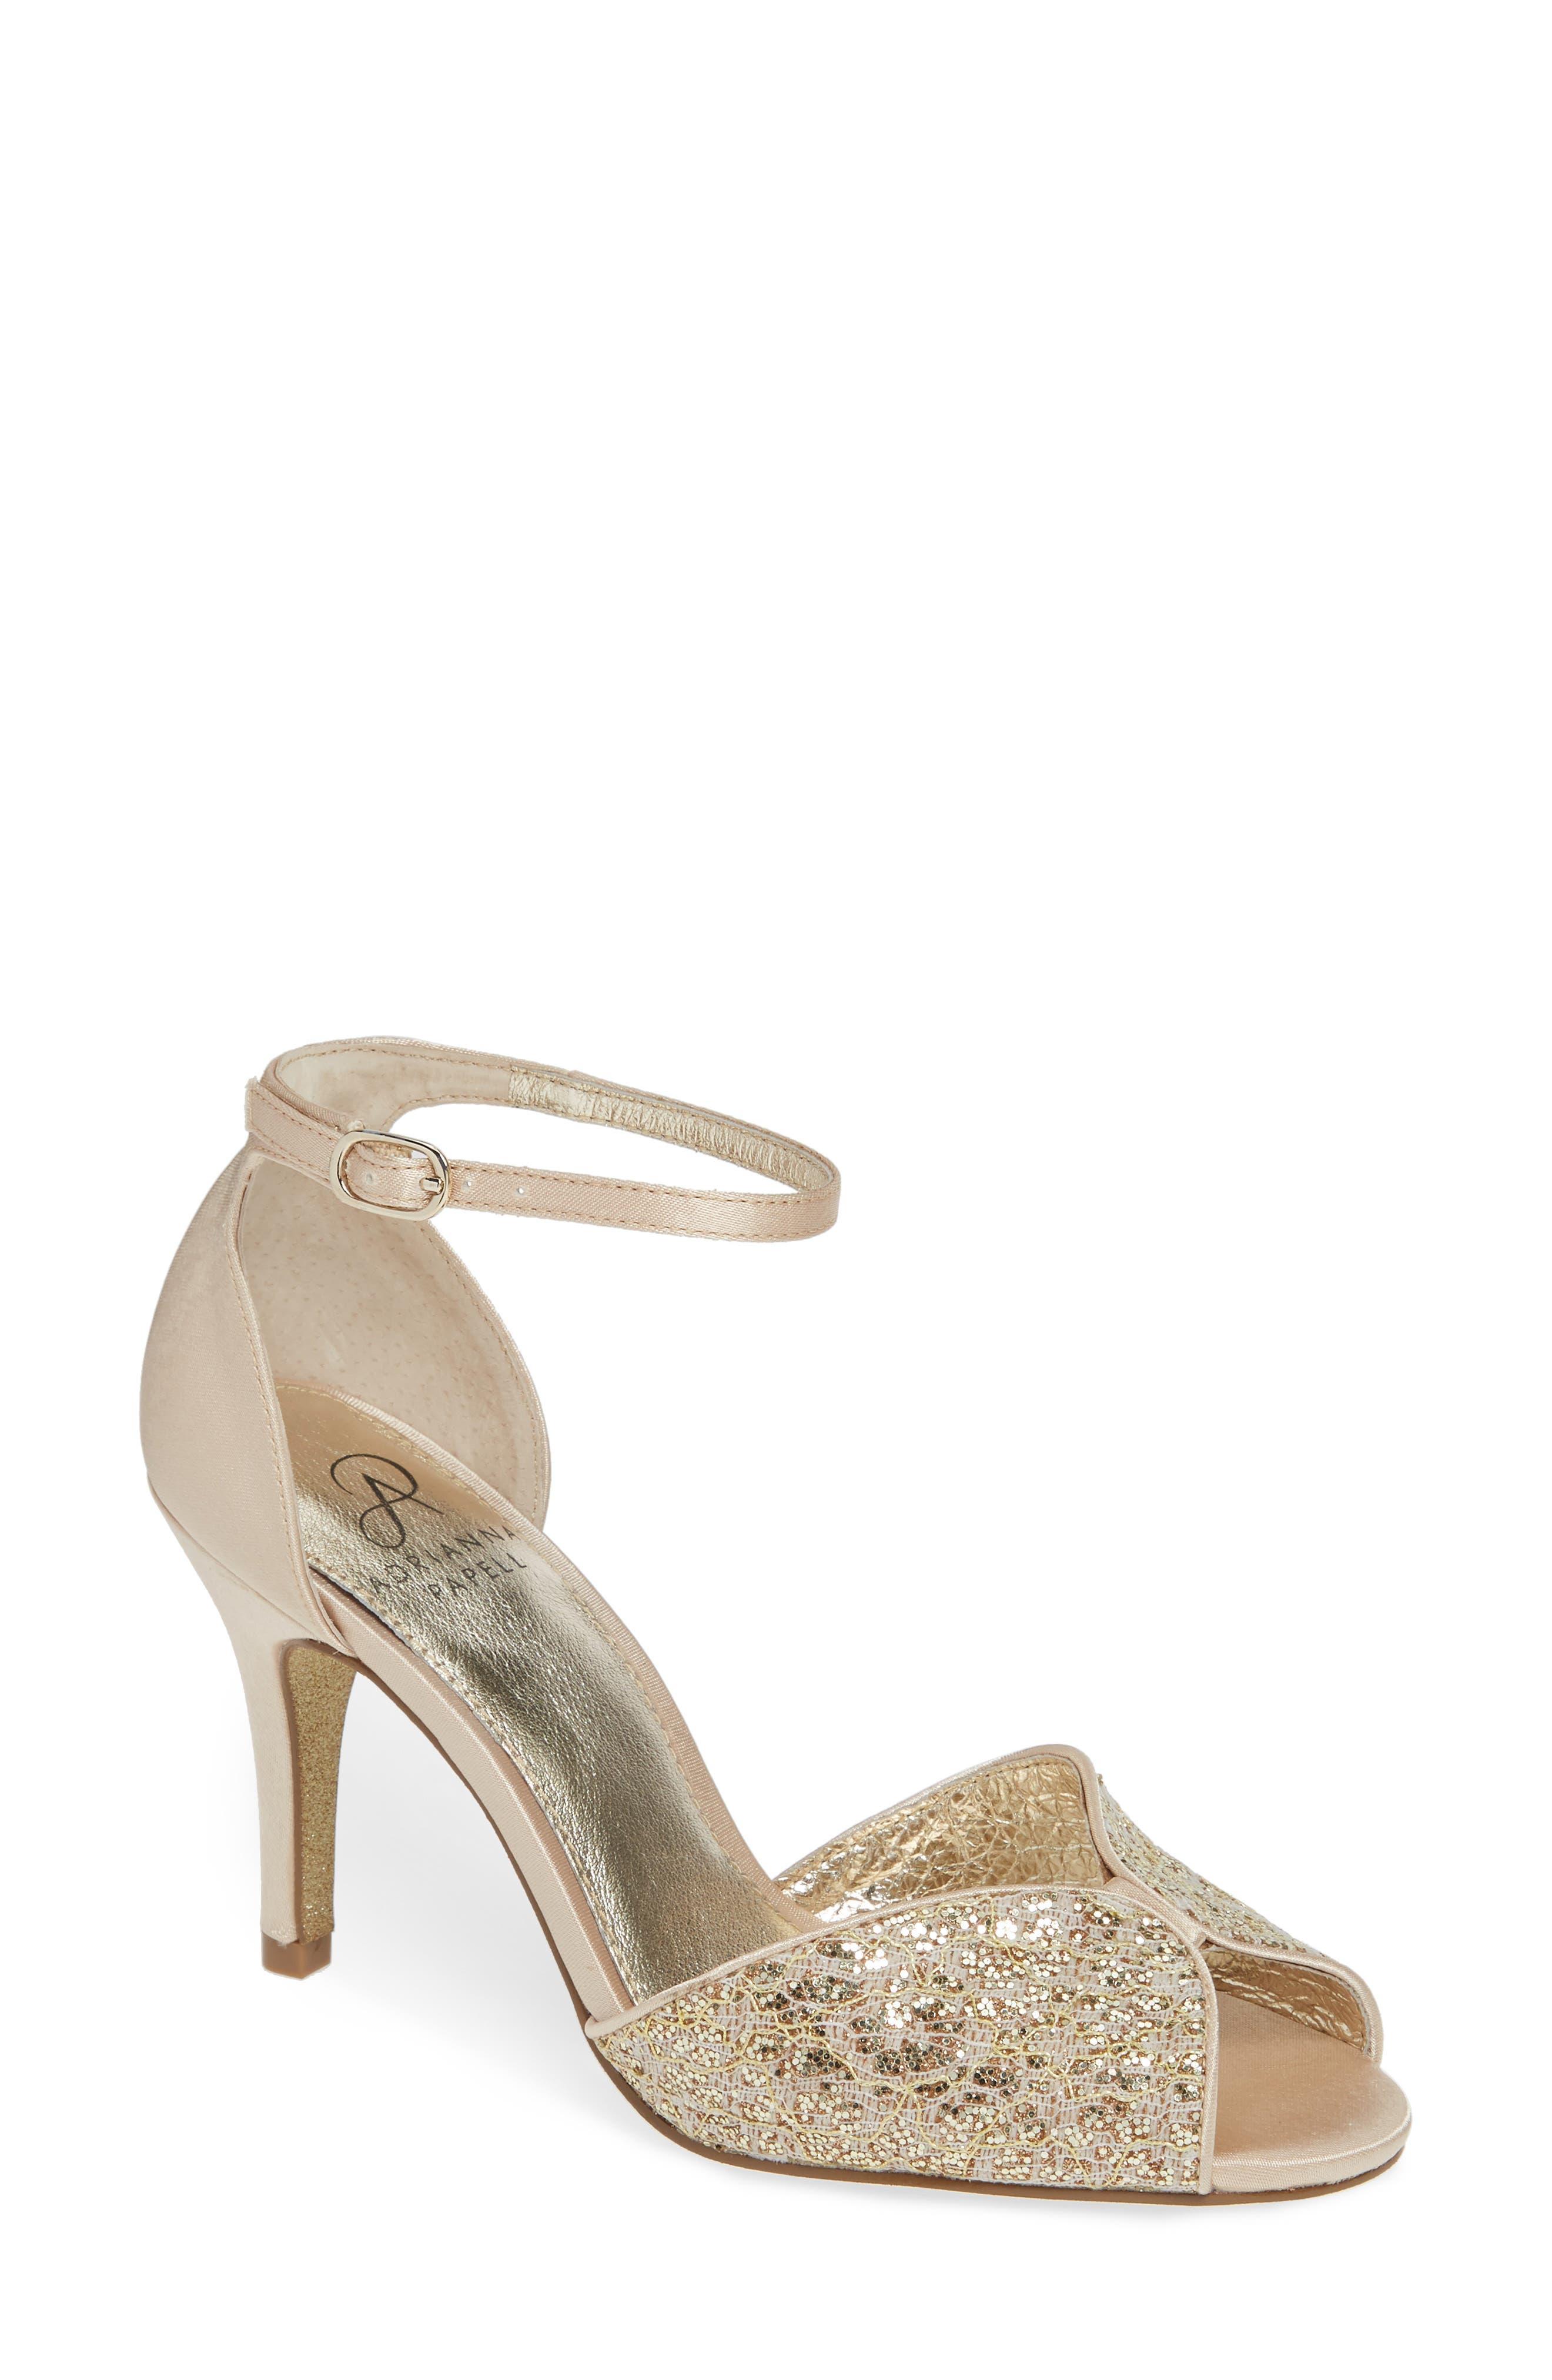 Adrianna Papell Fifi Ankle Strap Sandal- Metallic